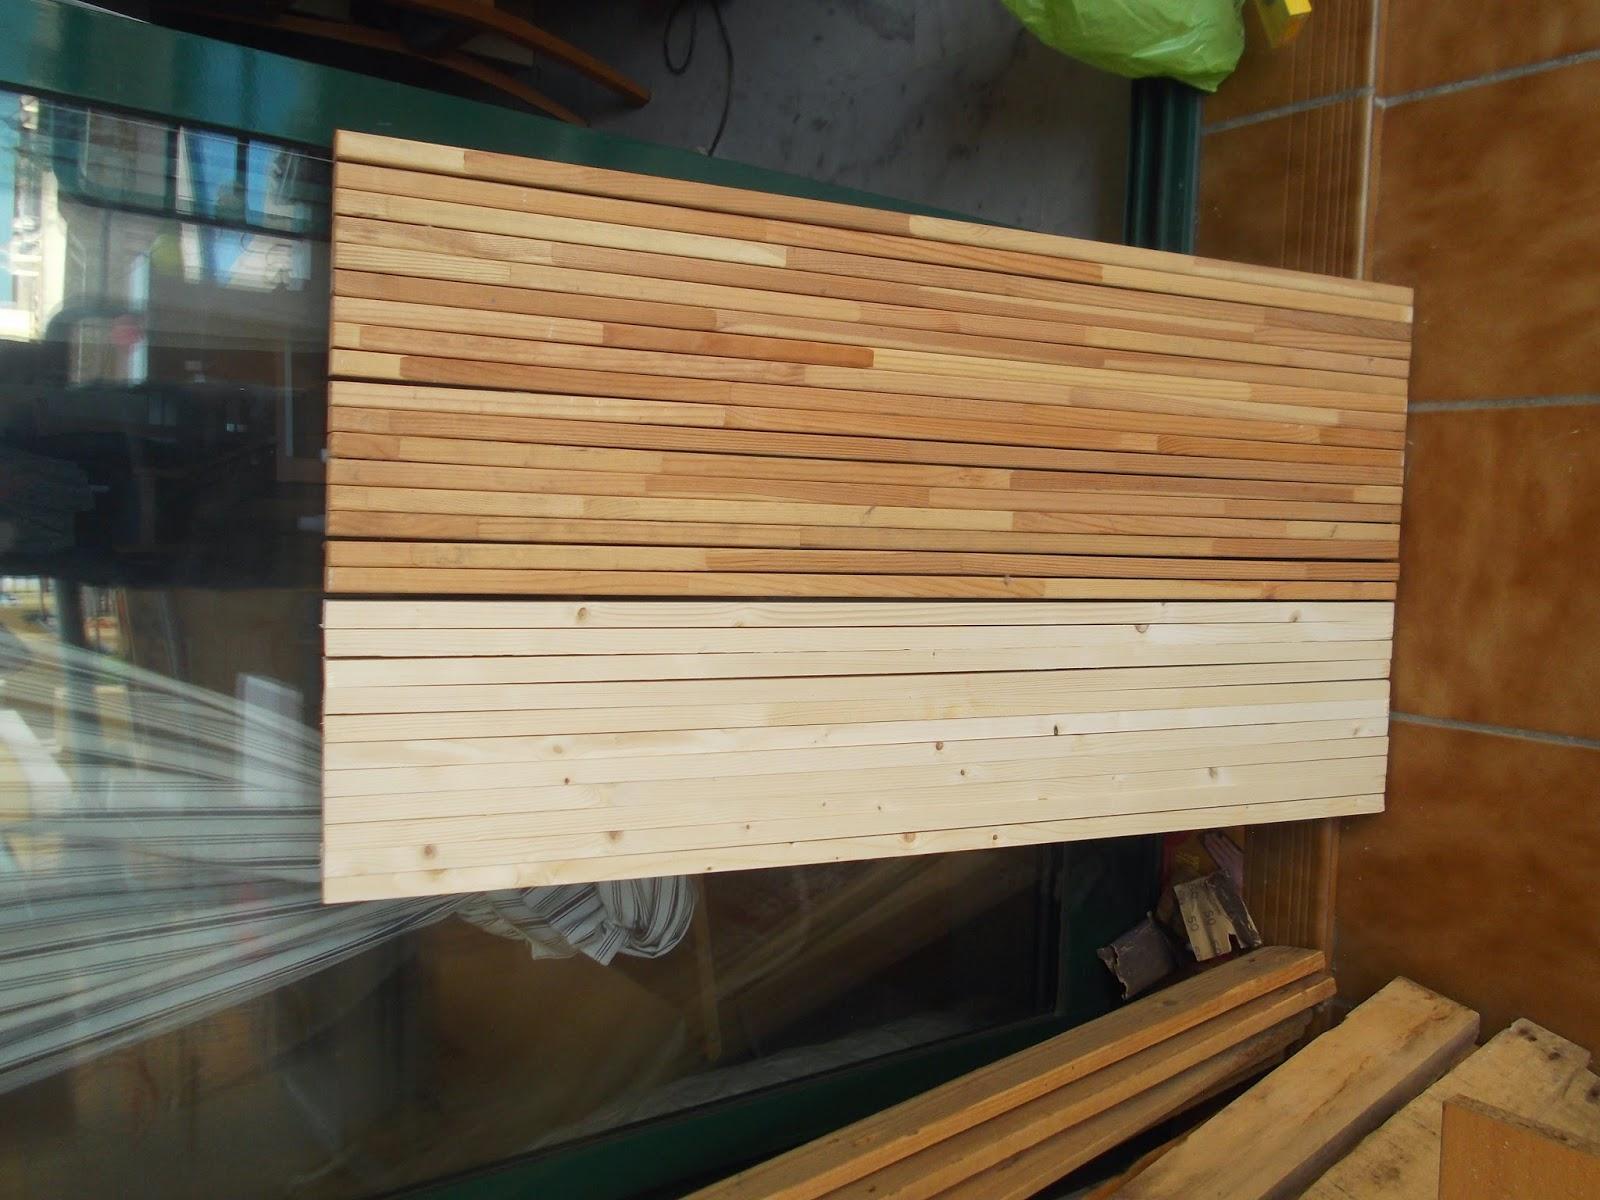 Cabecero cama de matrimonio reciclado diyambo blog for Reciclar una cama de madera